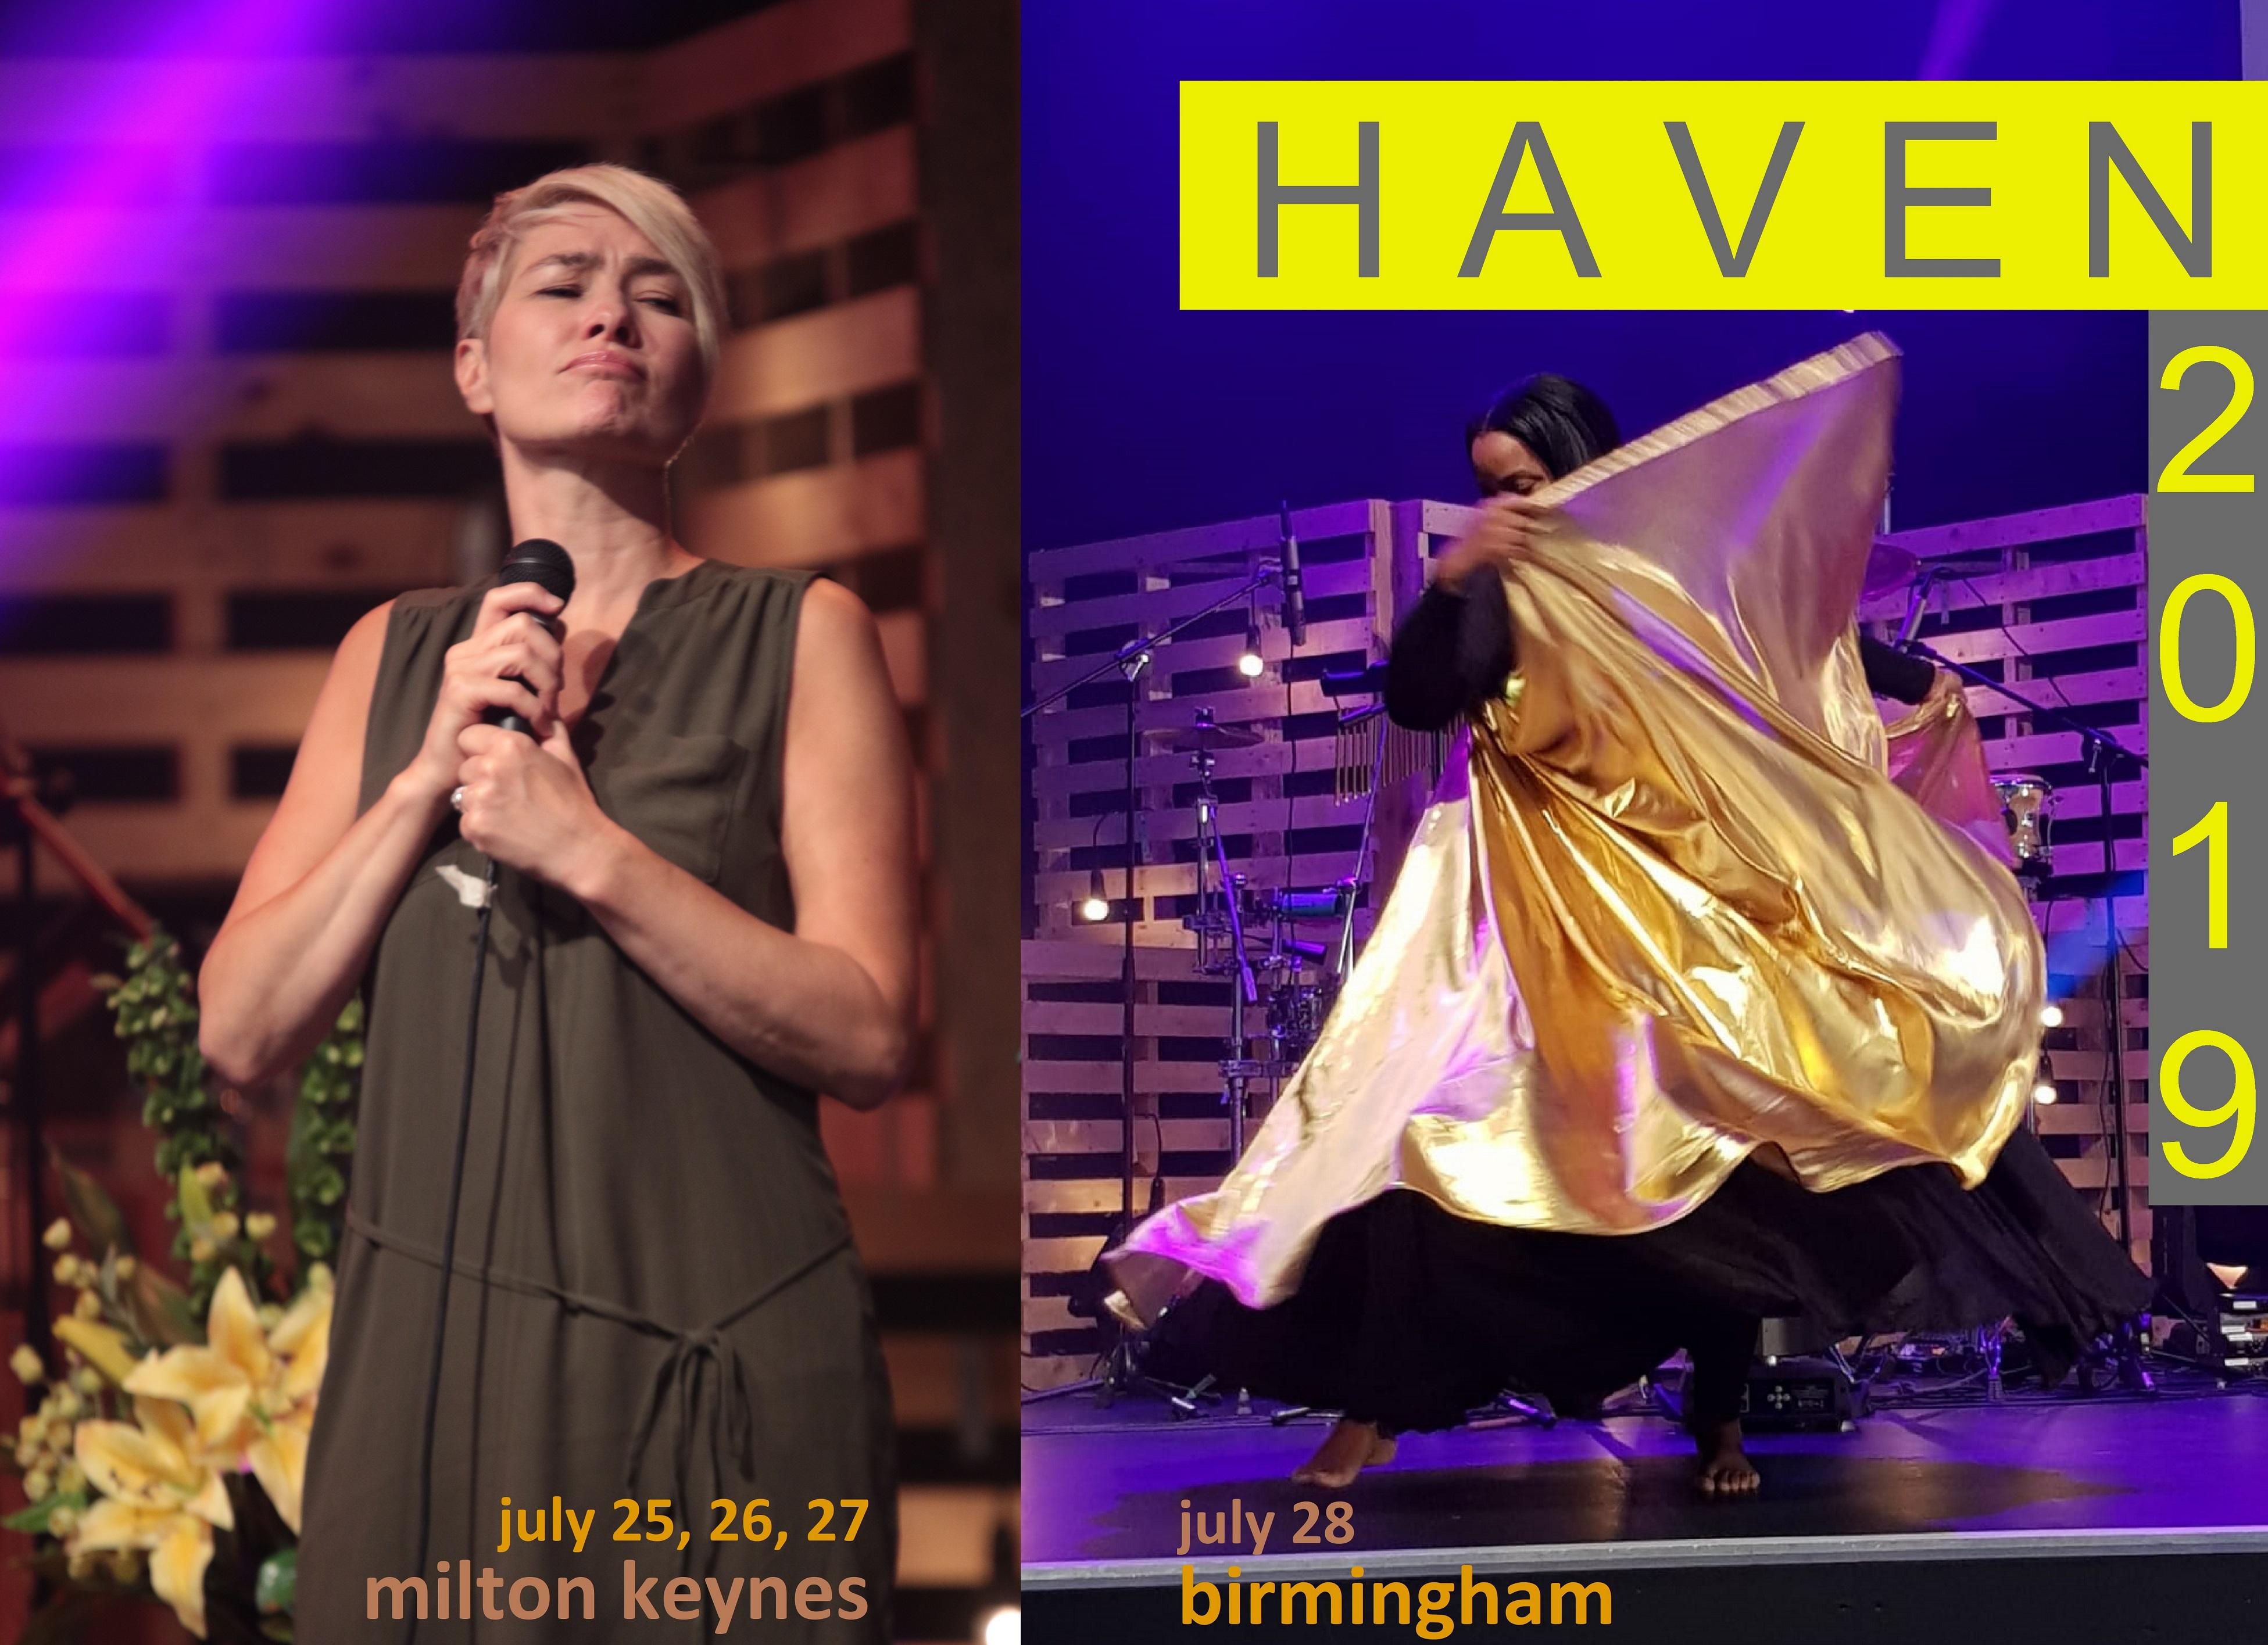 HAVEN 2019 Web Banner 74